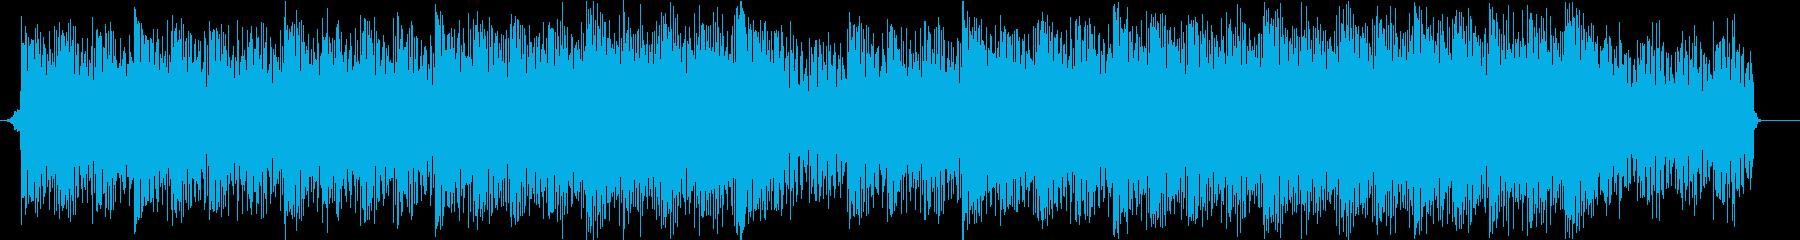 Distant Viewの再生済みの波形